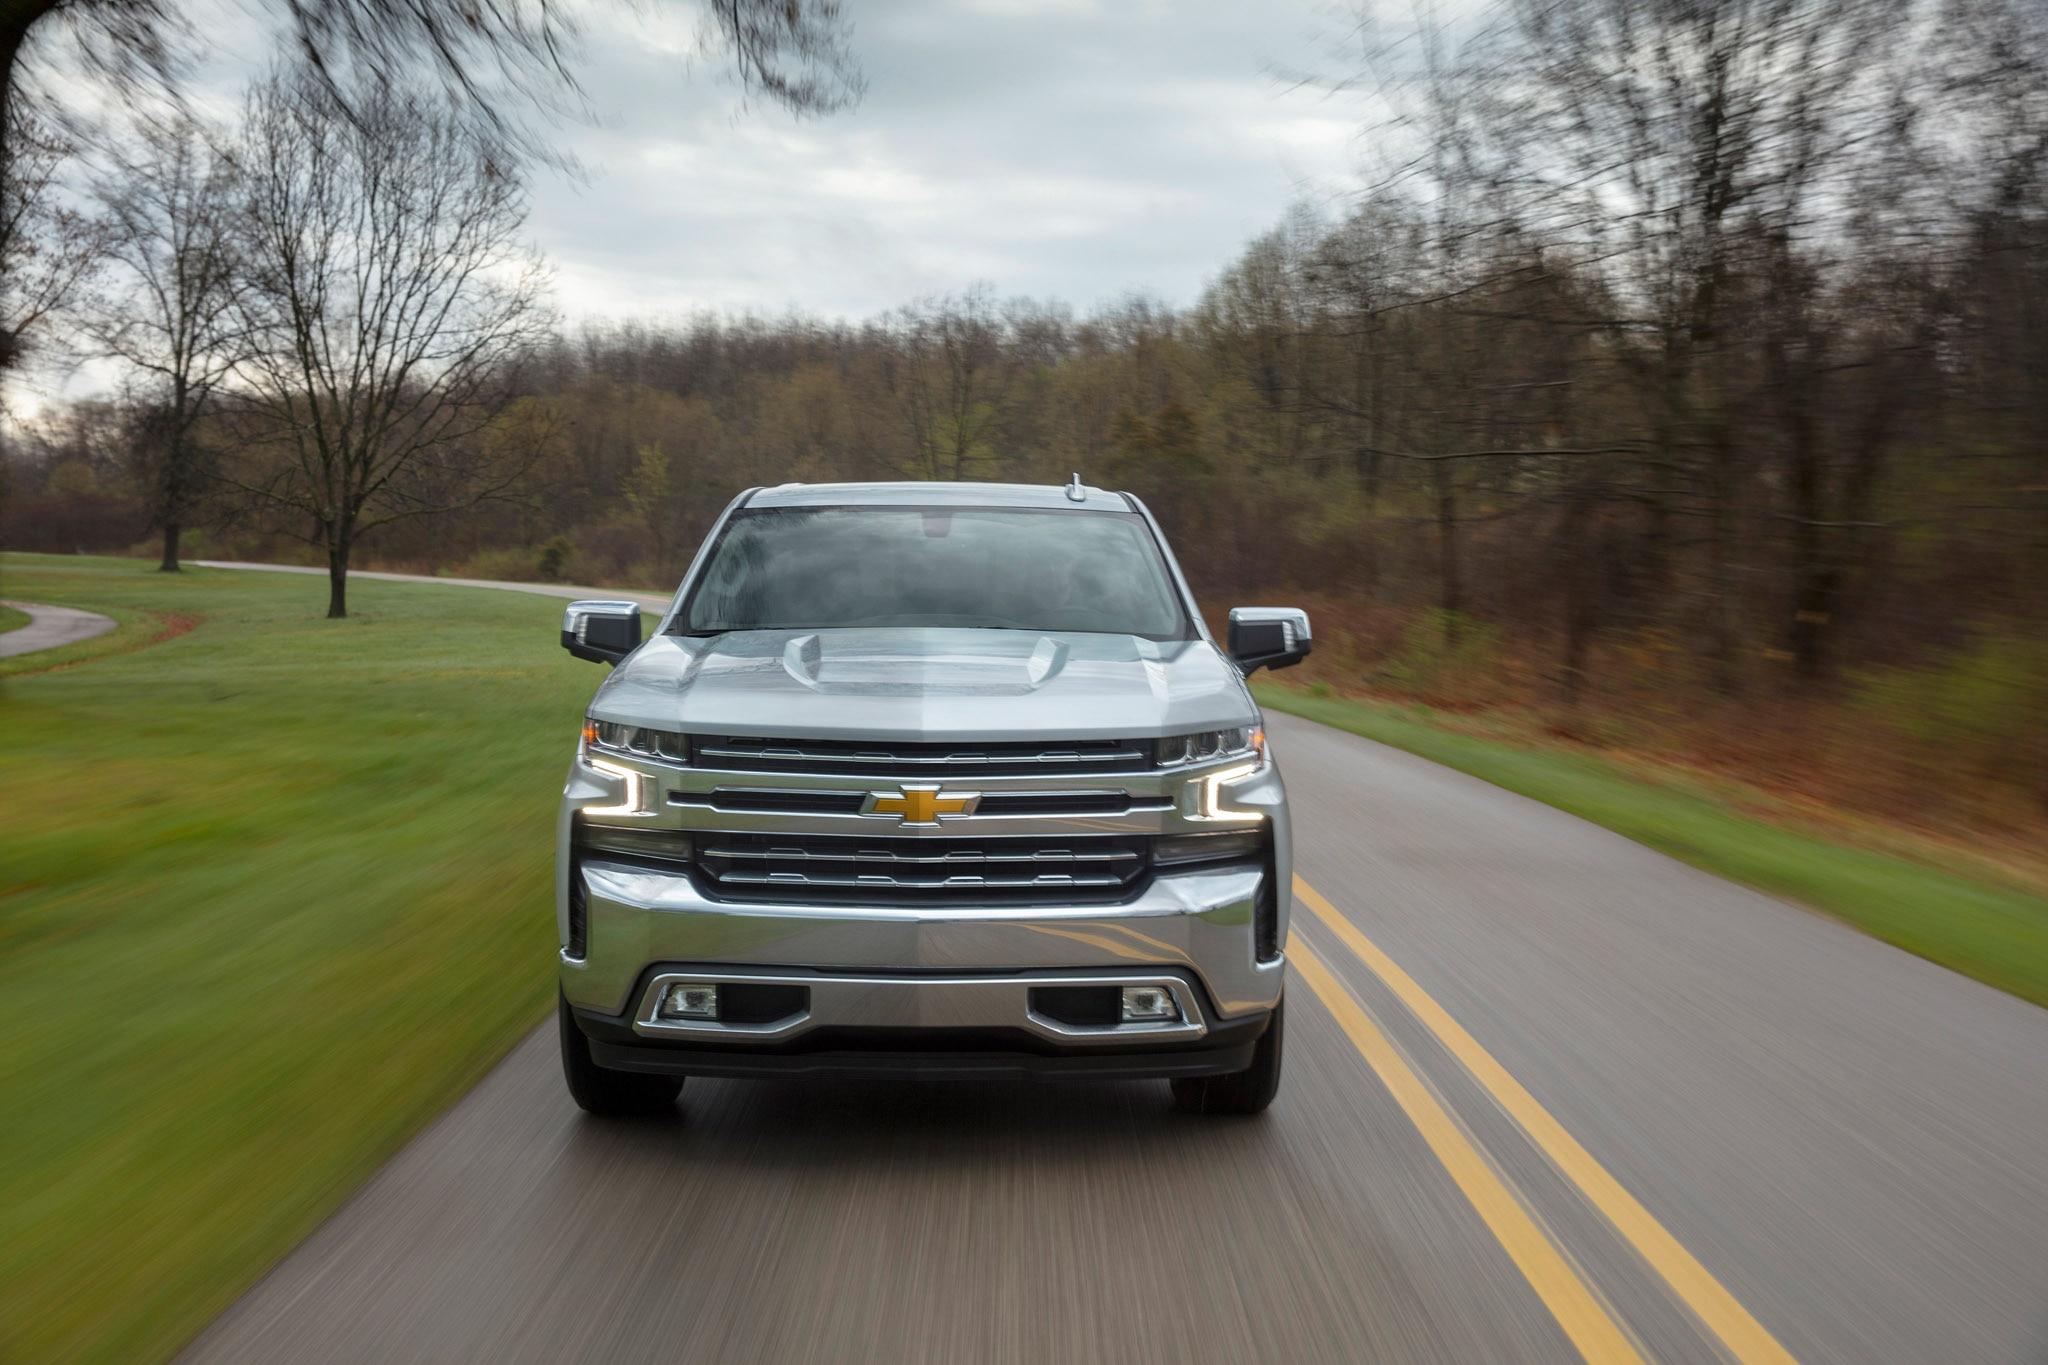 2019 Chevrolet Silverado Pricing Announced | Automobile ...